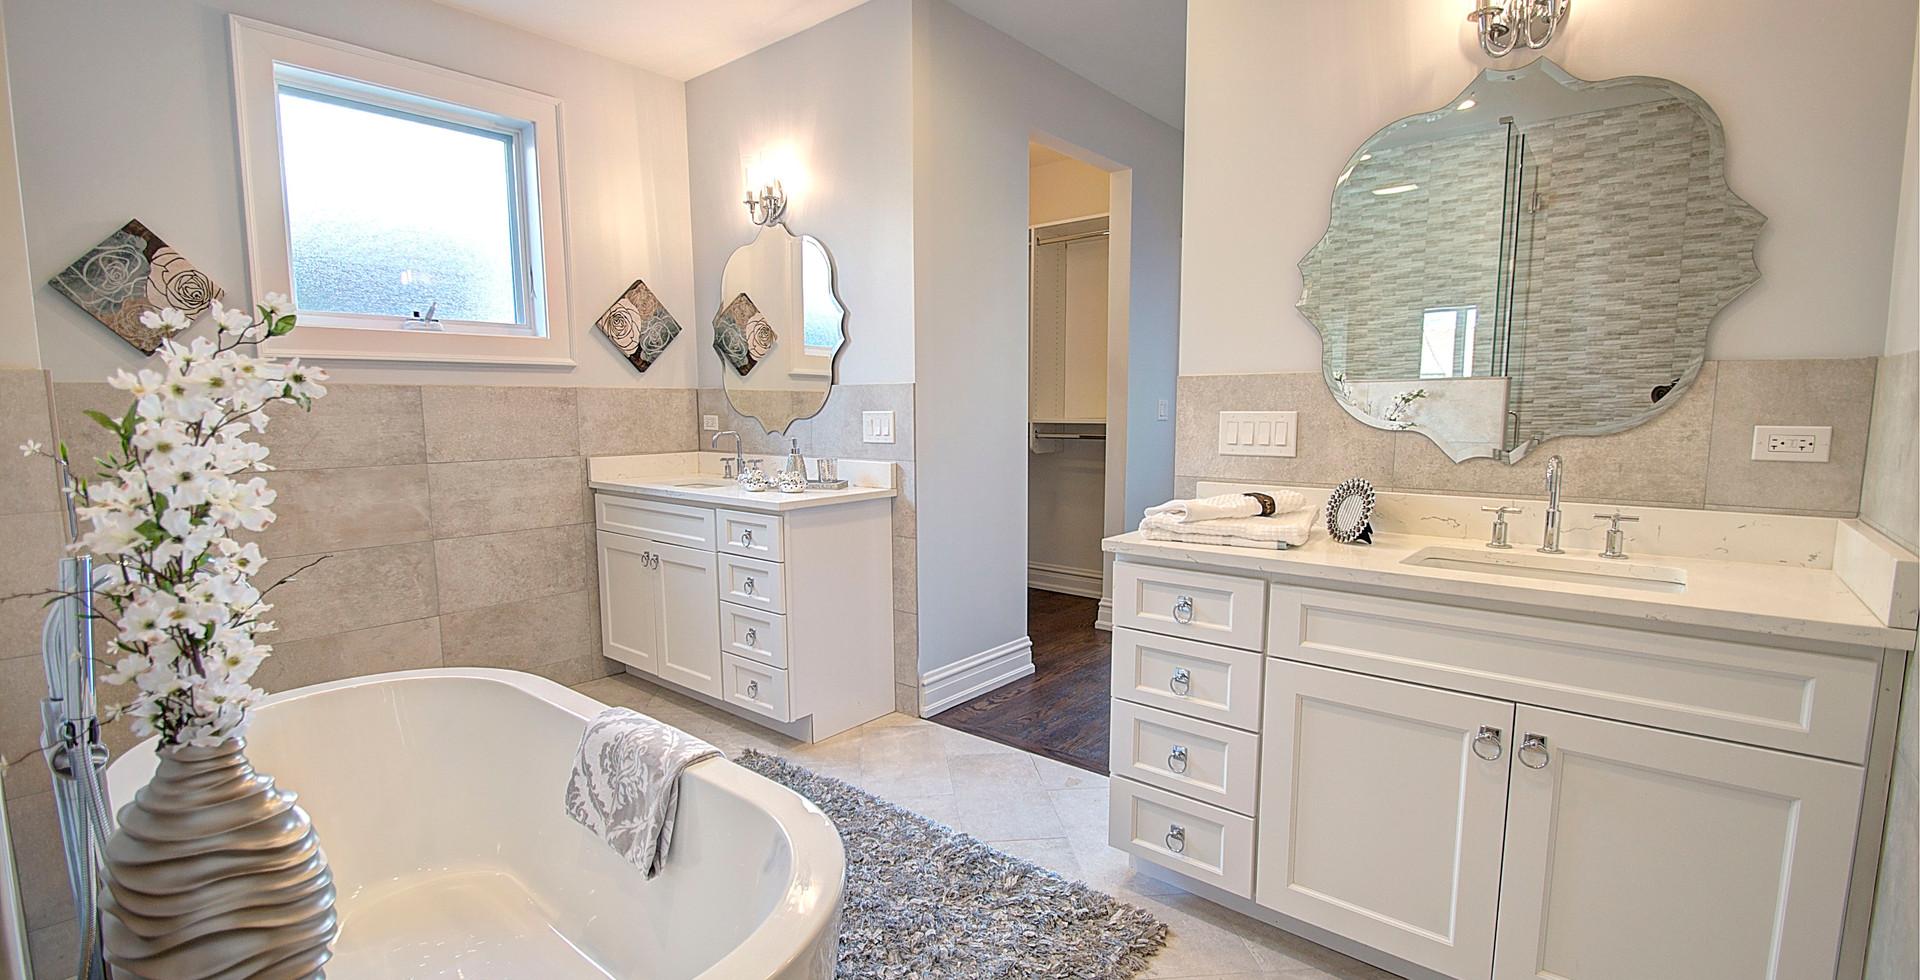 Bathroom in Aurora designed by MRM Home Design.jpg